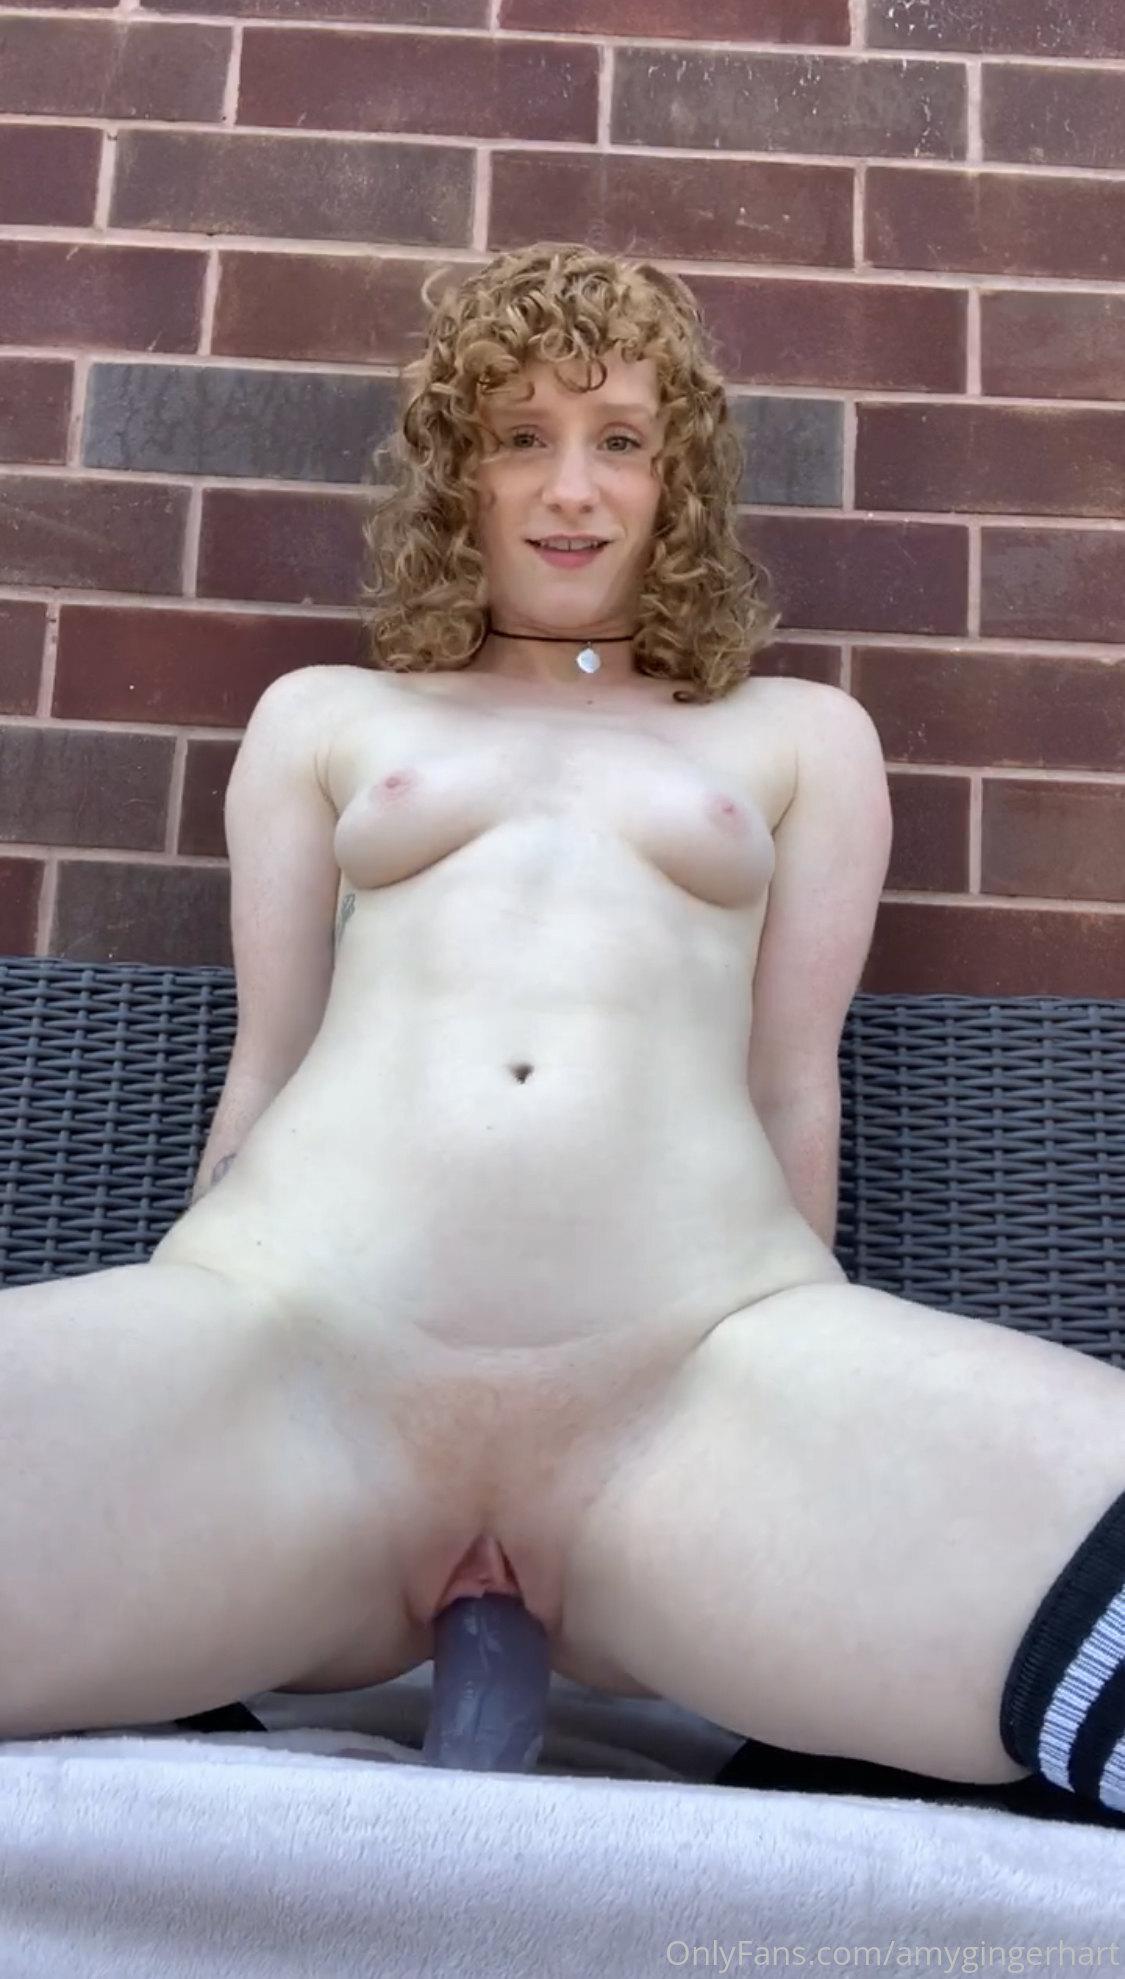 Amy Hart, Amygingerhart, Onlyfans 0174